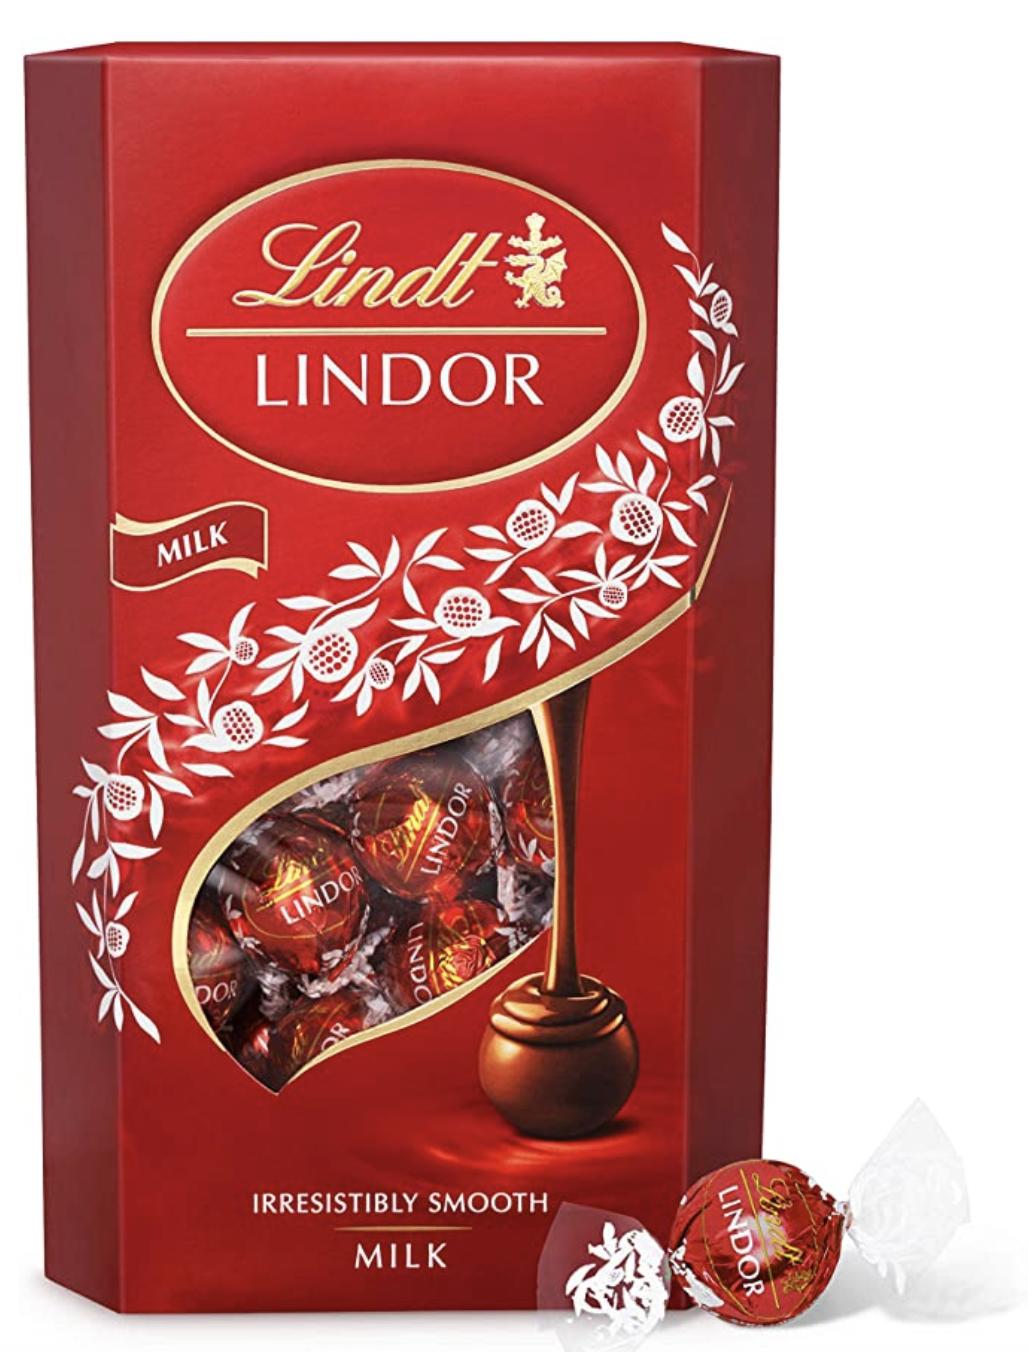 Lindt Lindor Milk Chocolate Truffles Box - approximately 48 Balls, 600g - £10 (+£4.49 Non-Prime / £9.50 S&S) @ Amazon